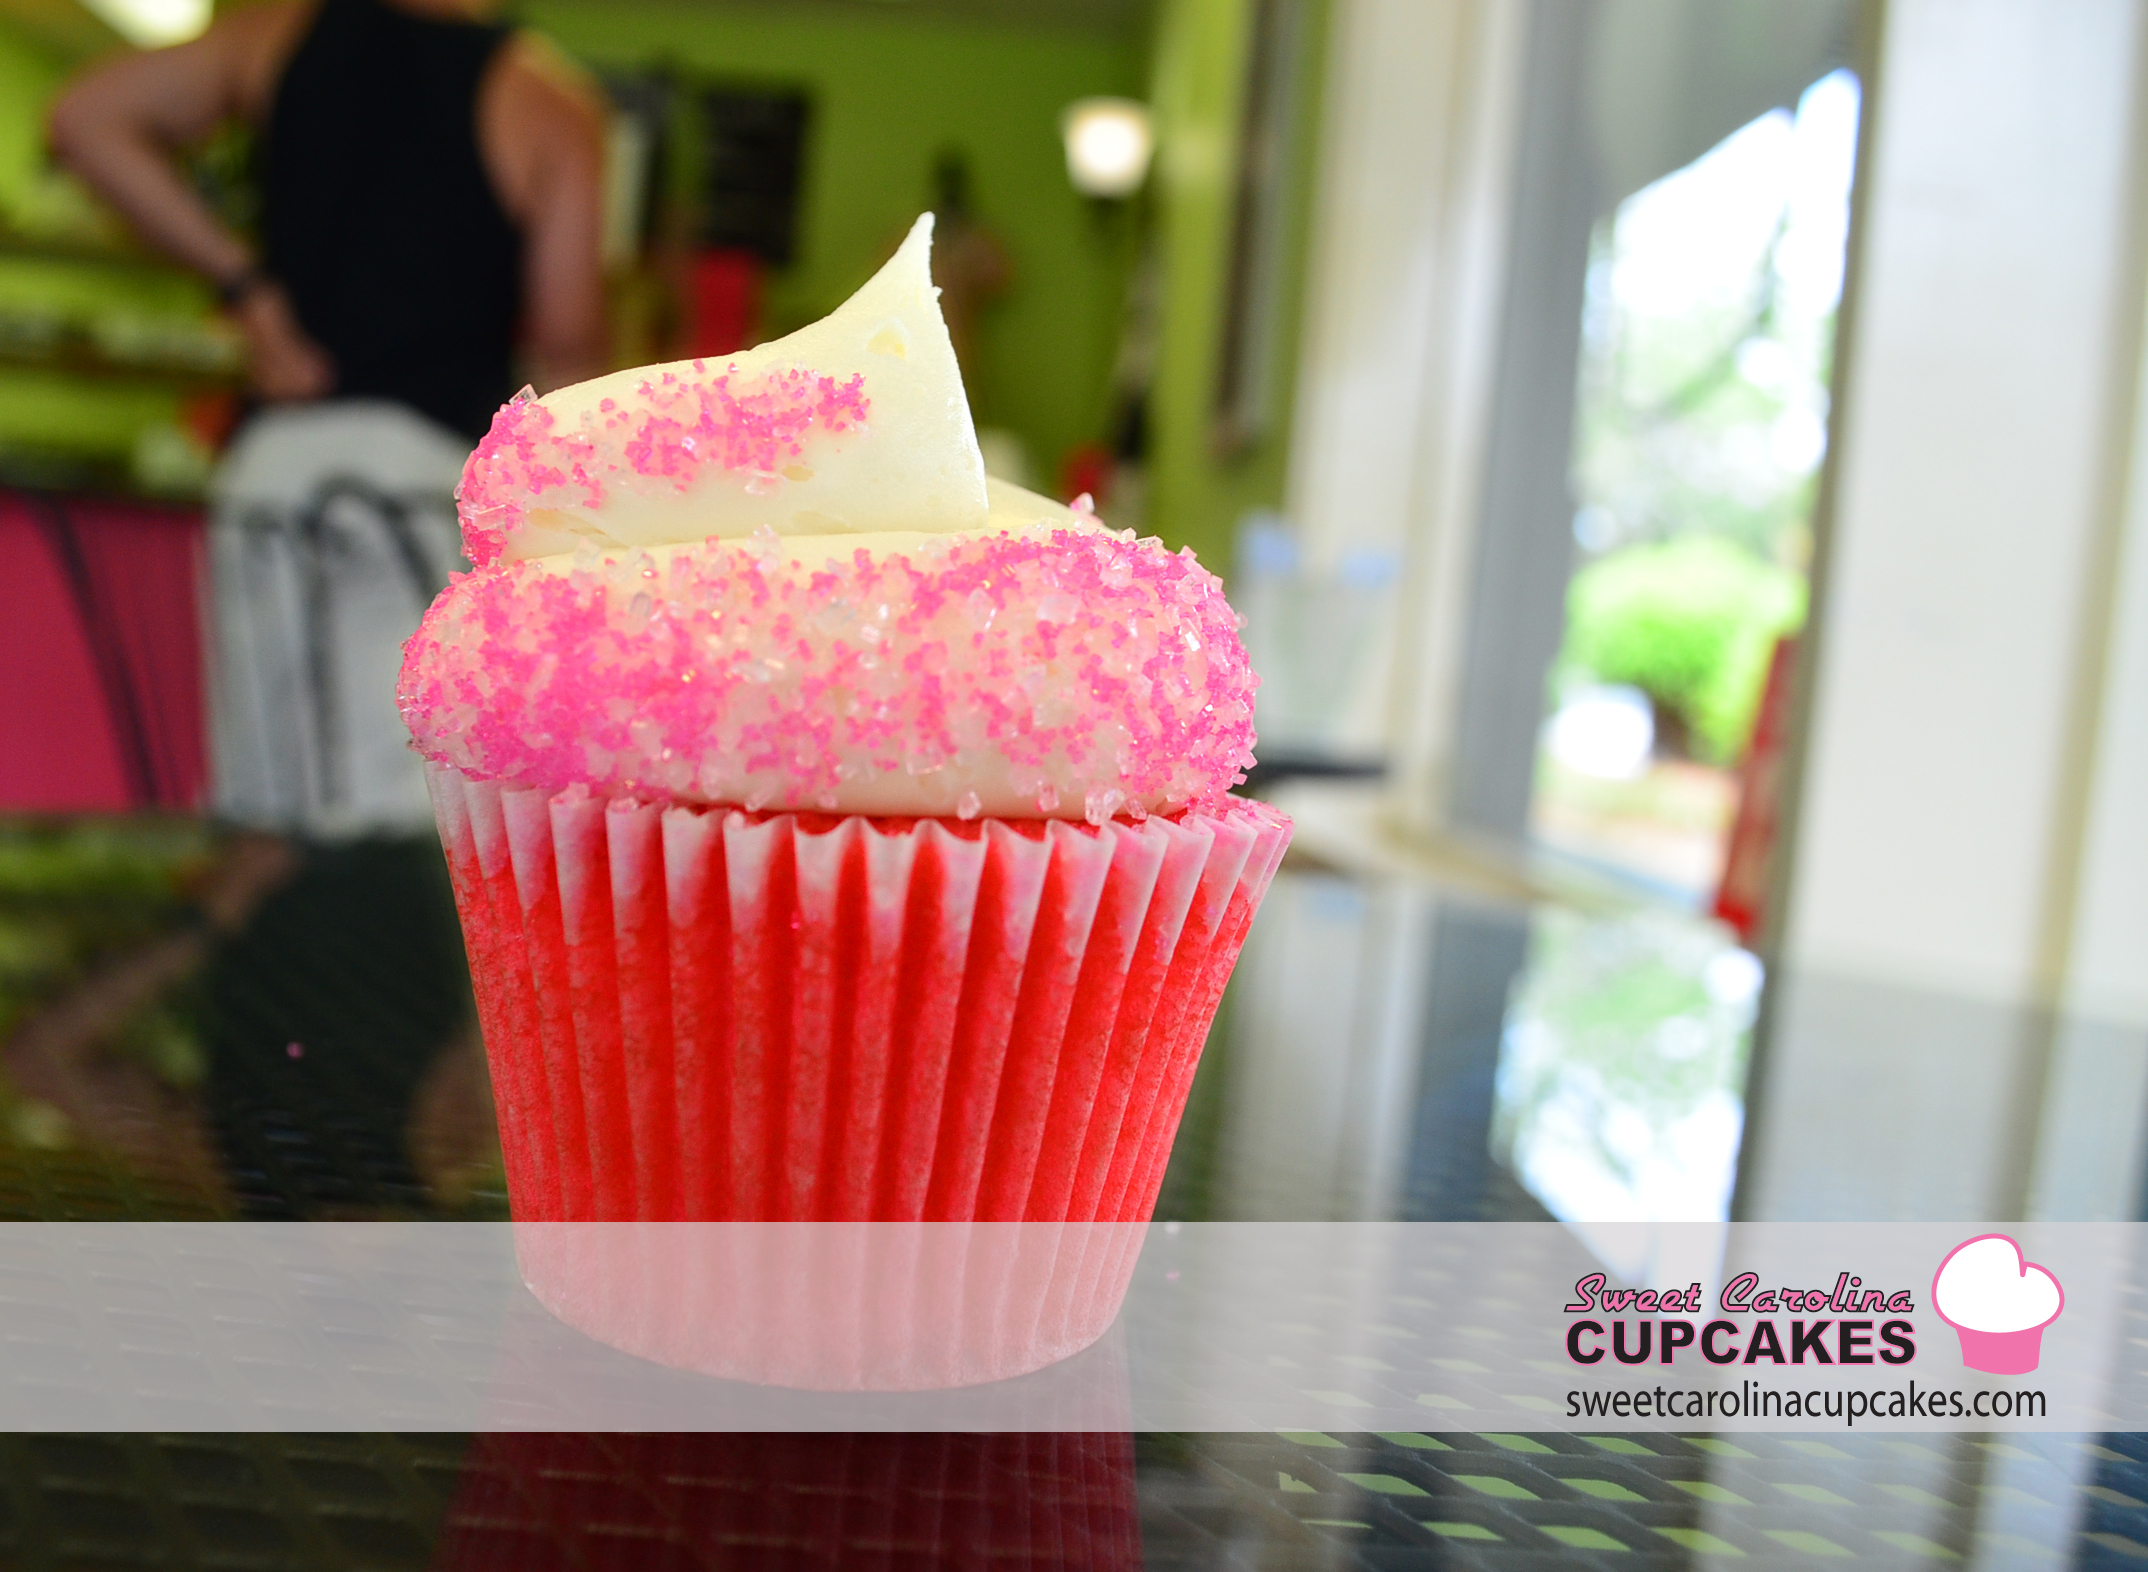 Sweet Carolina Cupcakes Hilton Head